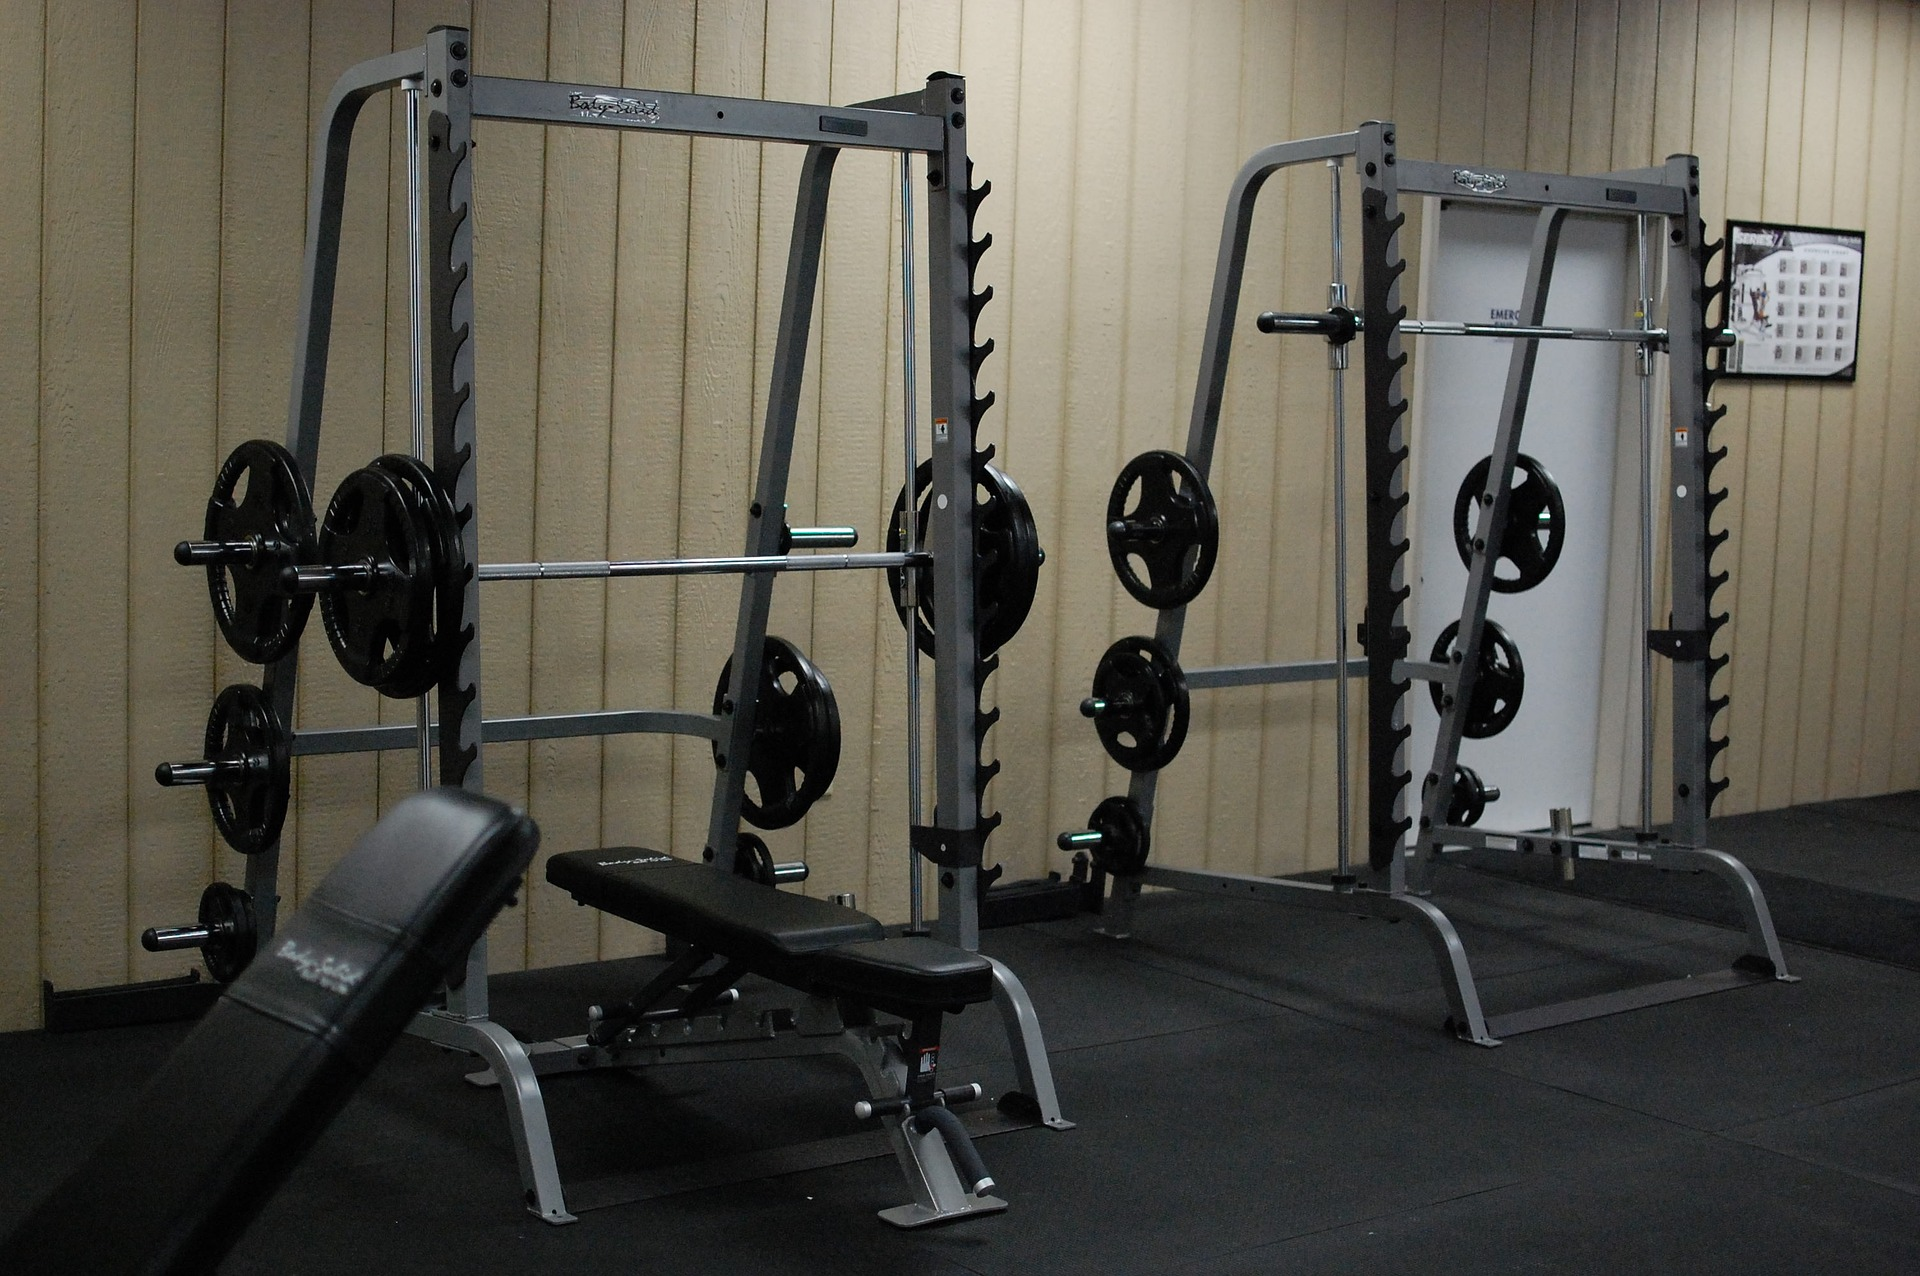 Squat Rack and Bench.jpg